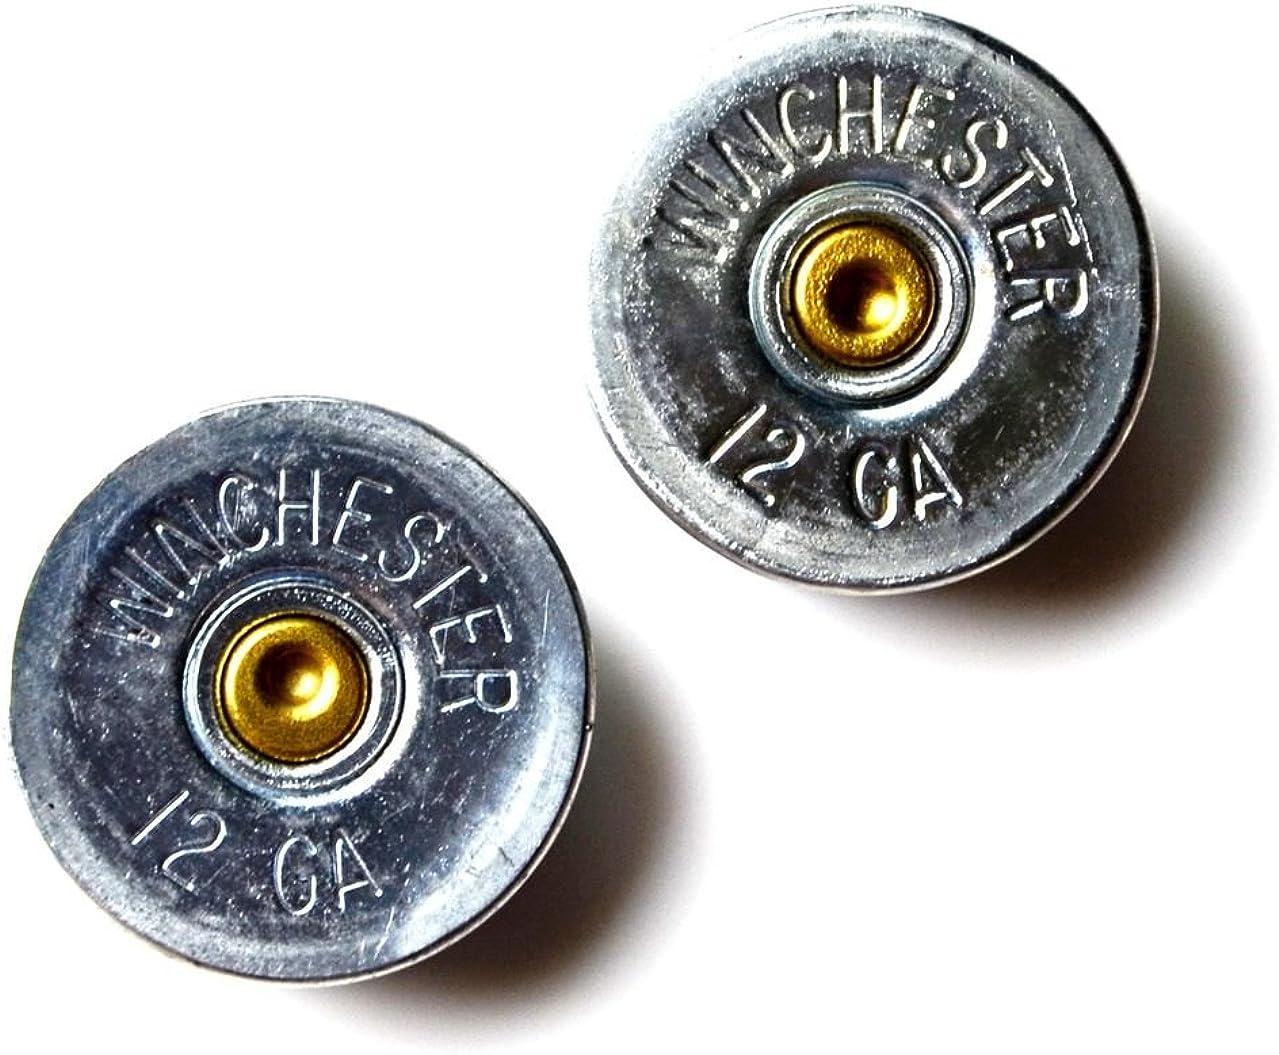 Quality Handcrafts Guaranteed Shotgun Shell Cufflinks